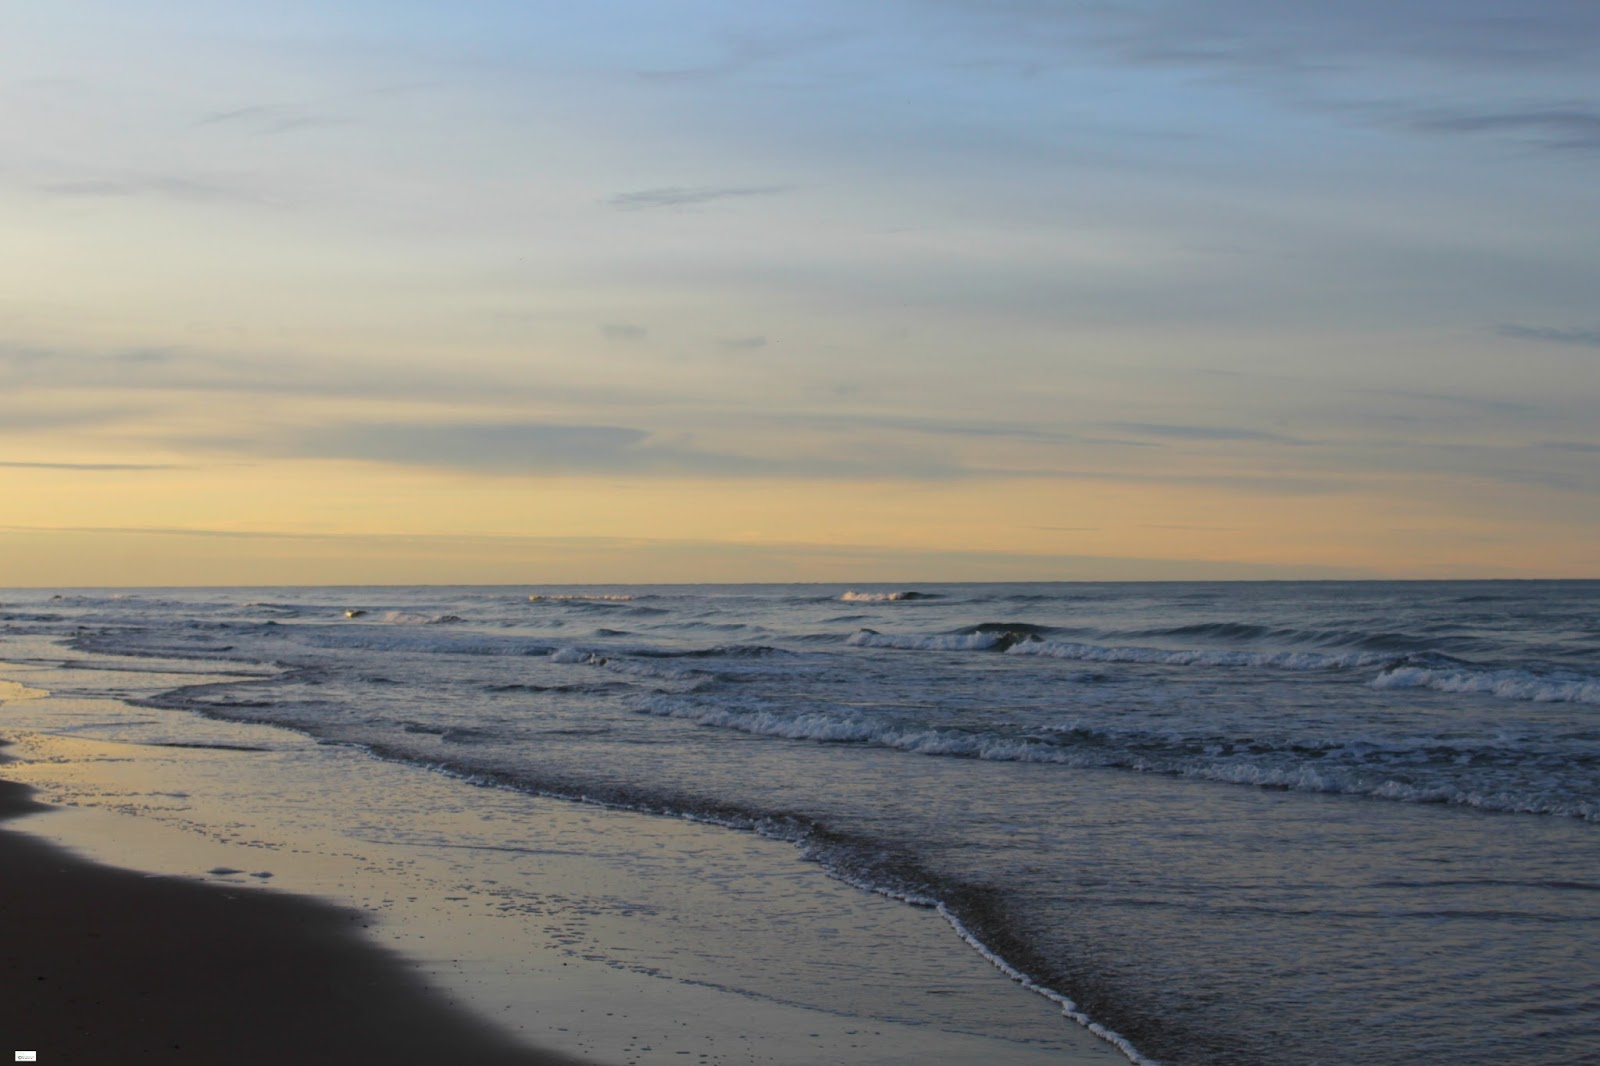 Caravan Sonnet A Walk On The Beach Beside The Rugged